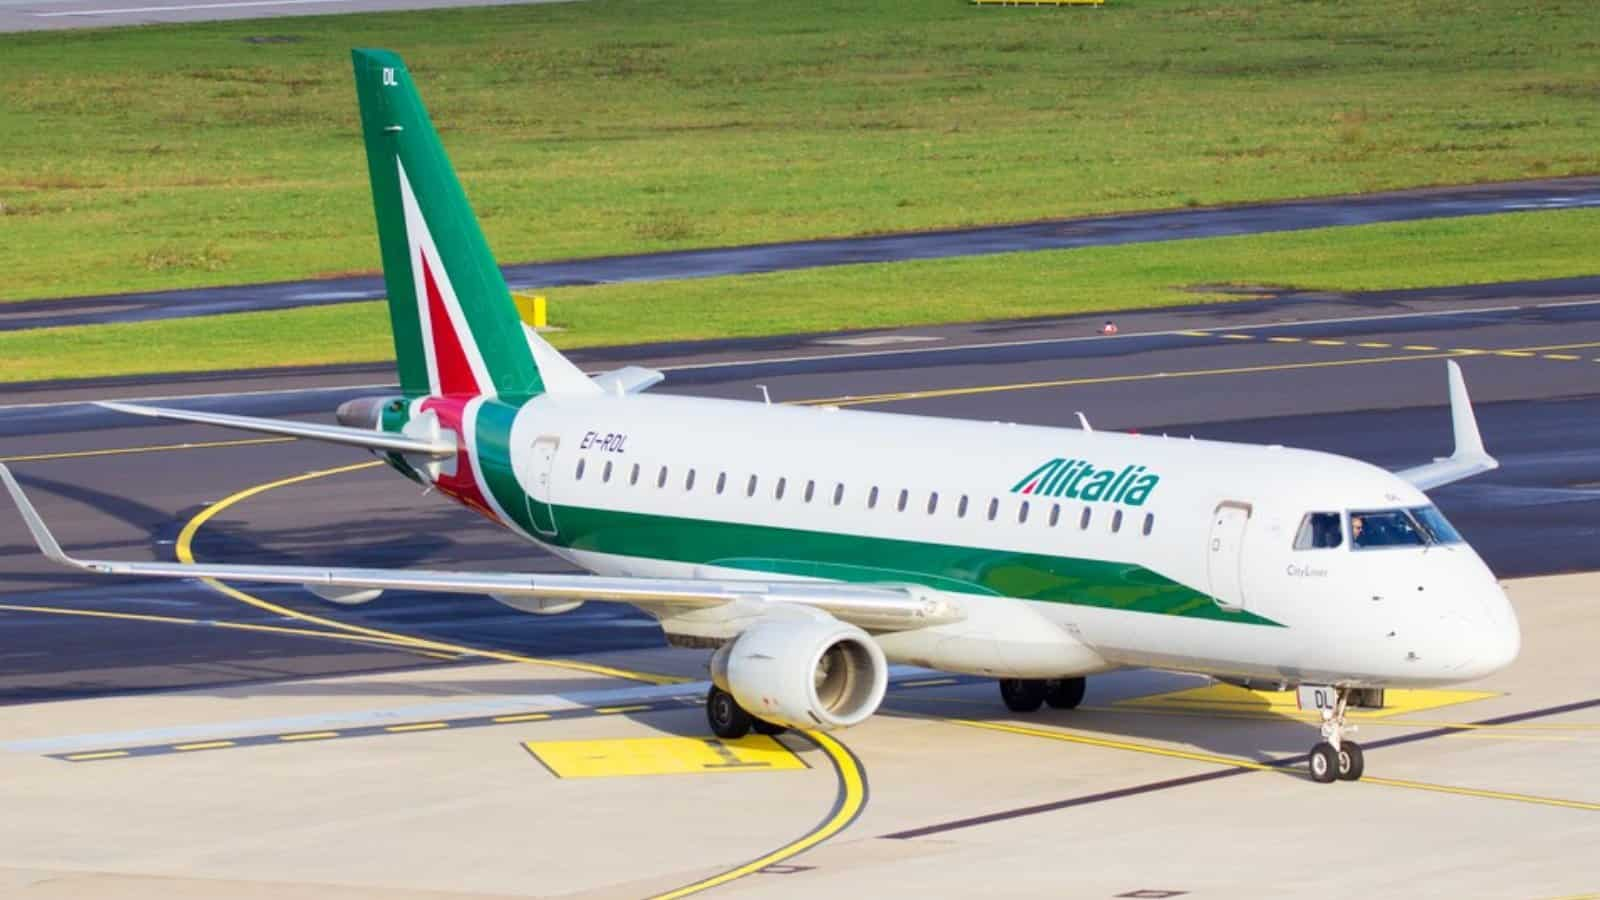 Autocertificazione Alitalia digitale